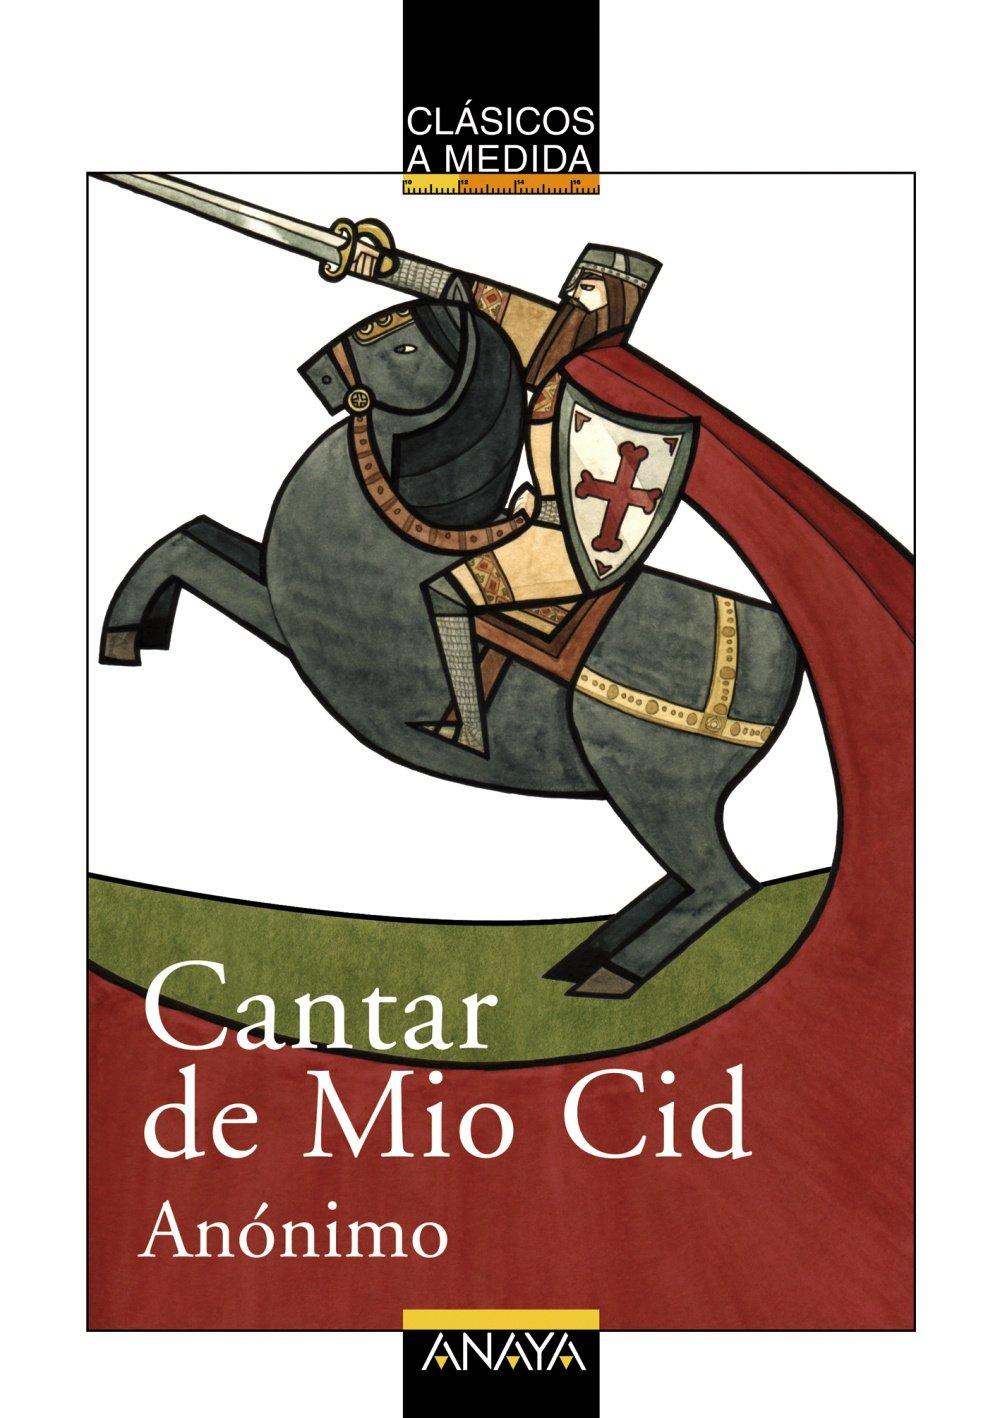 Cantar de Mio Cid (CLÁSICOS - Clásicos a Medida): Amazon.es: Esther Gili, Emilio Fontanilla Debesa: Libros